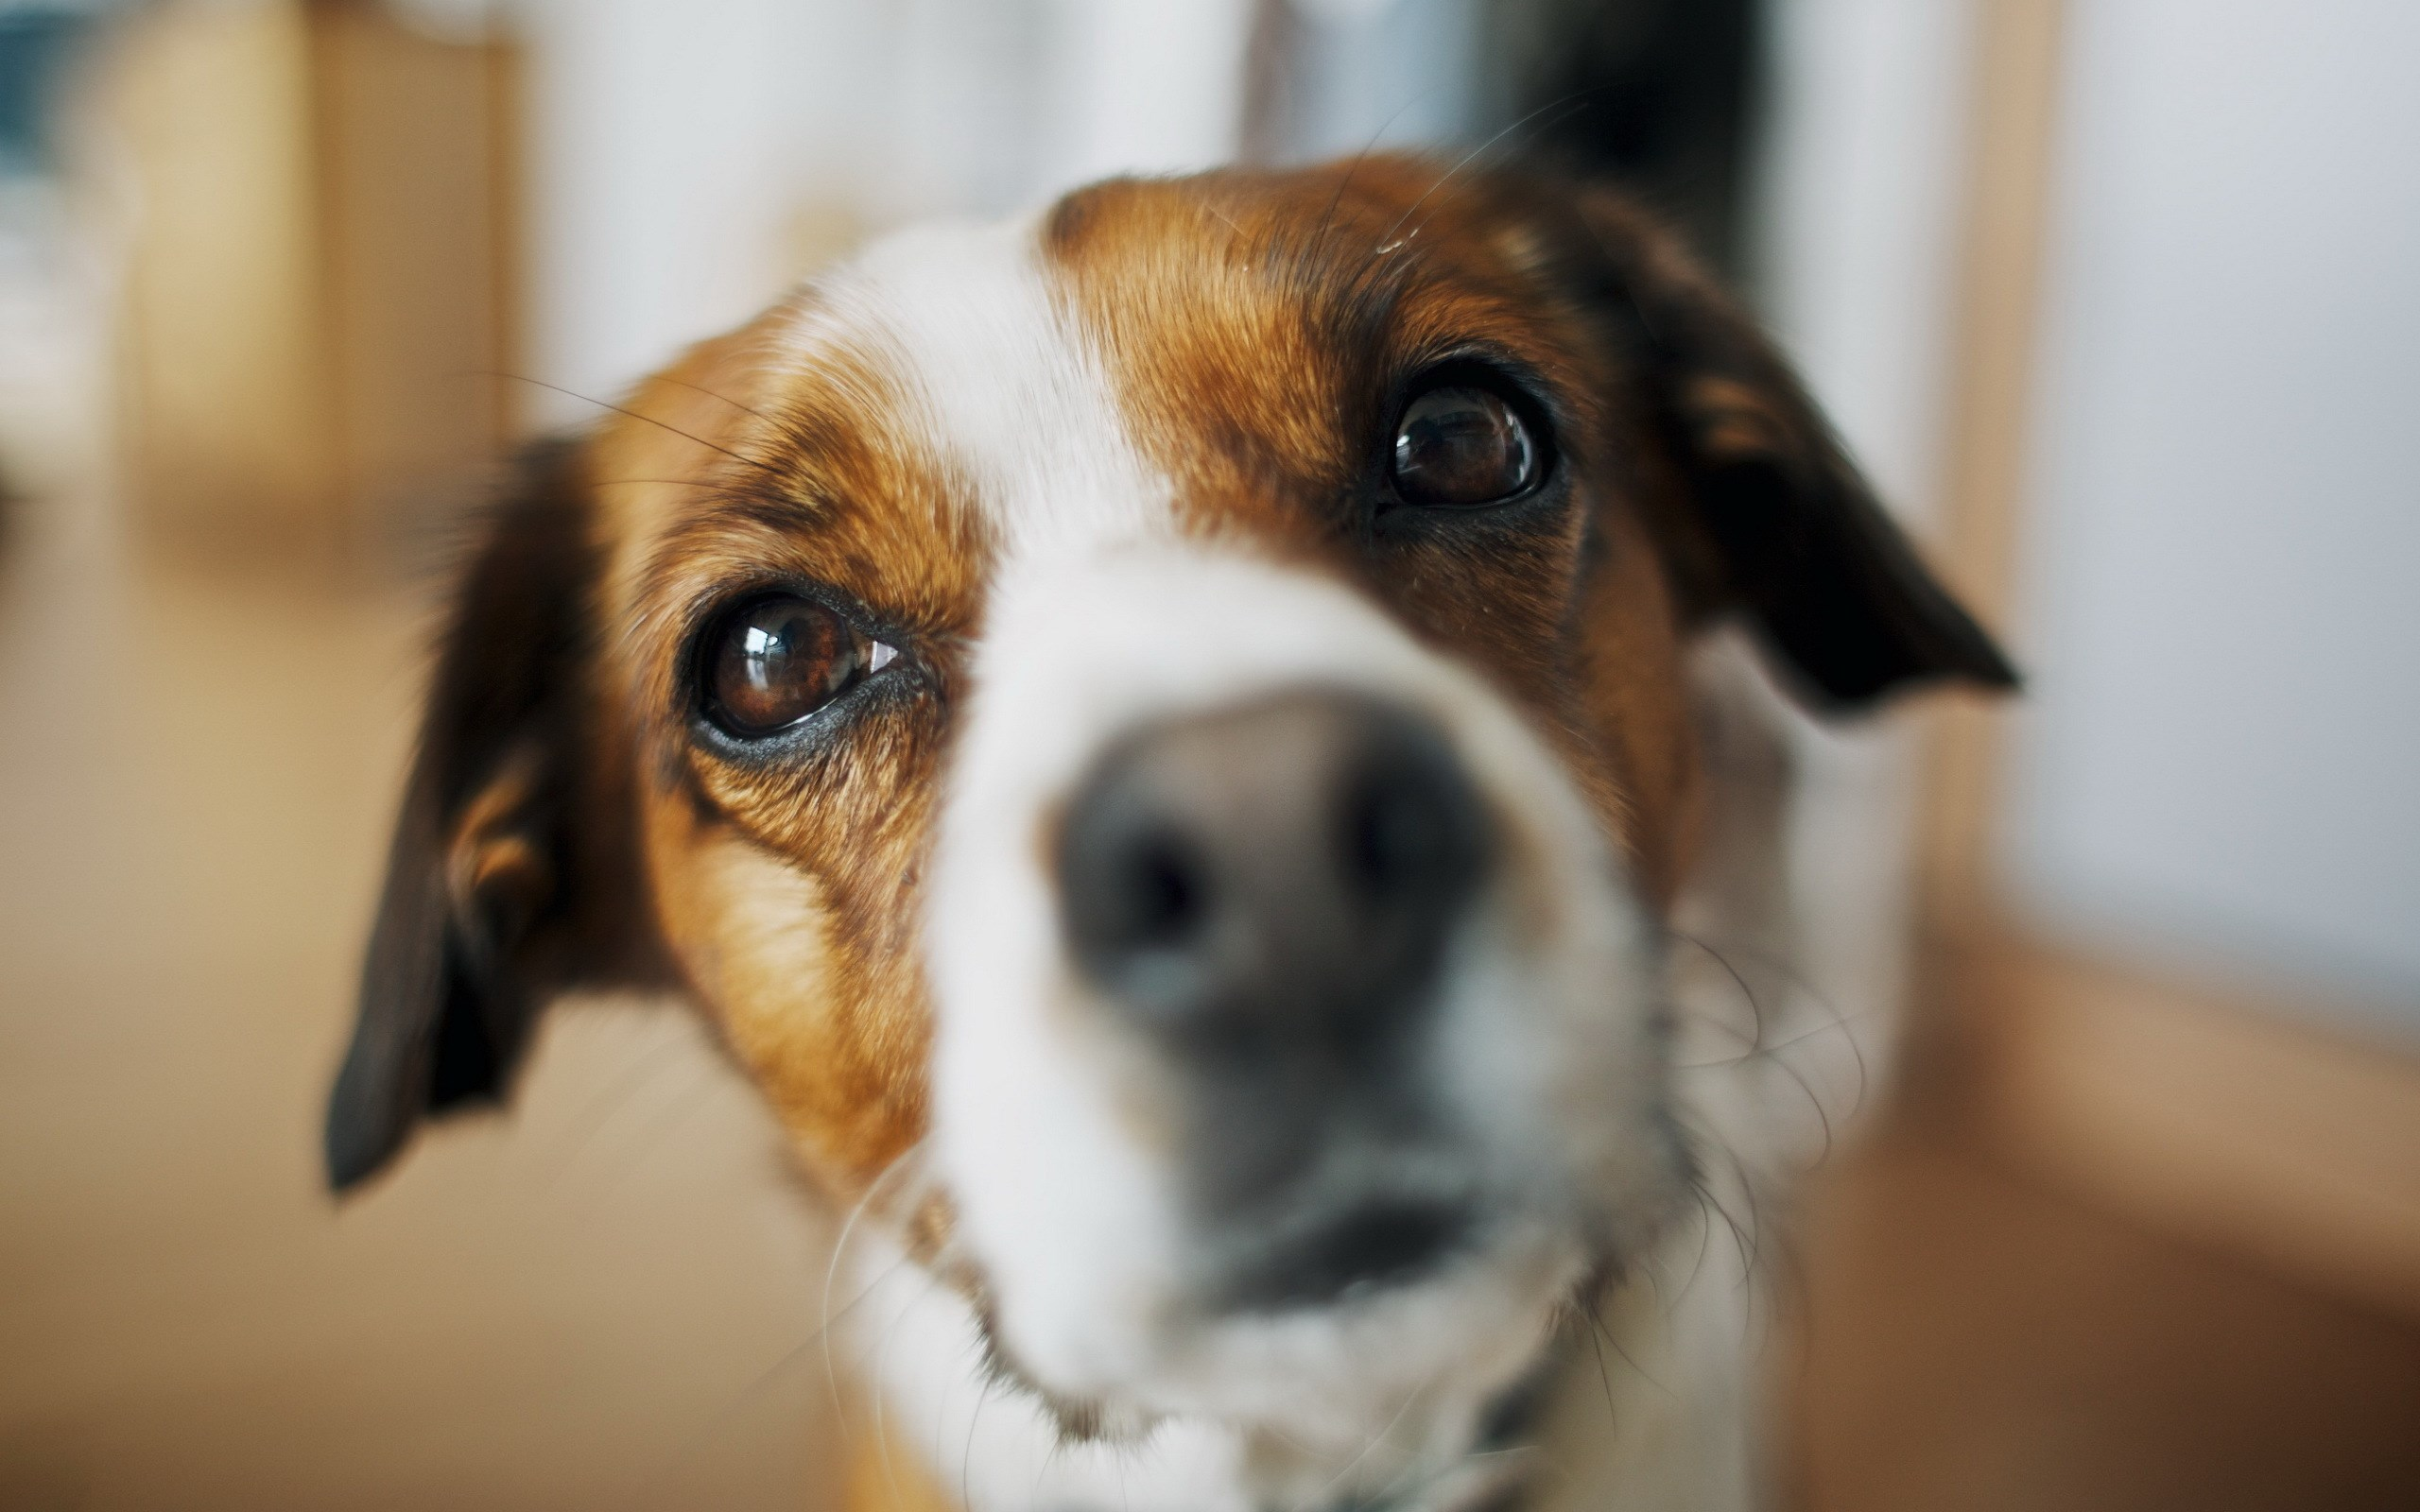 dog look close up wallpaper 44124